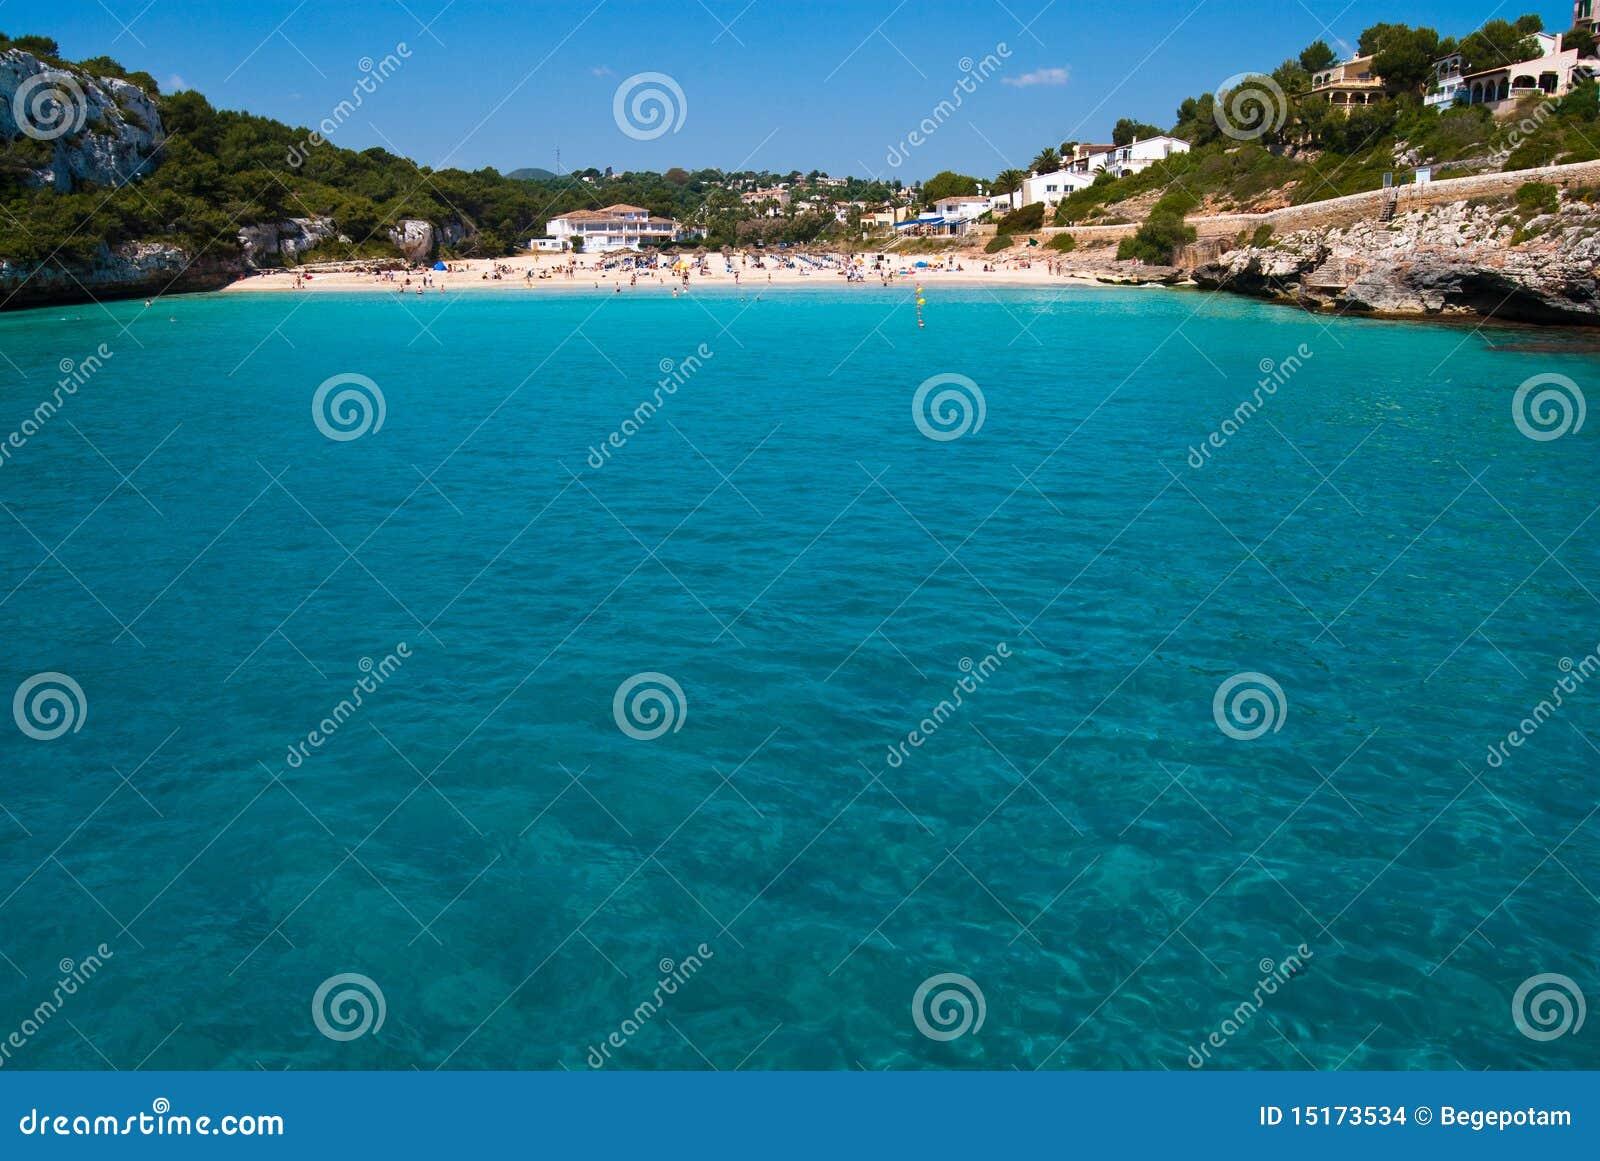 Cala Romantica Spain  city pictures gallery : The Beach Of Cala Romantica, Majorca, Spain Stock Images Image ...